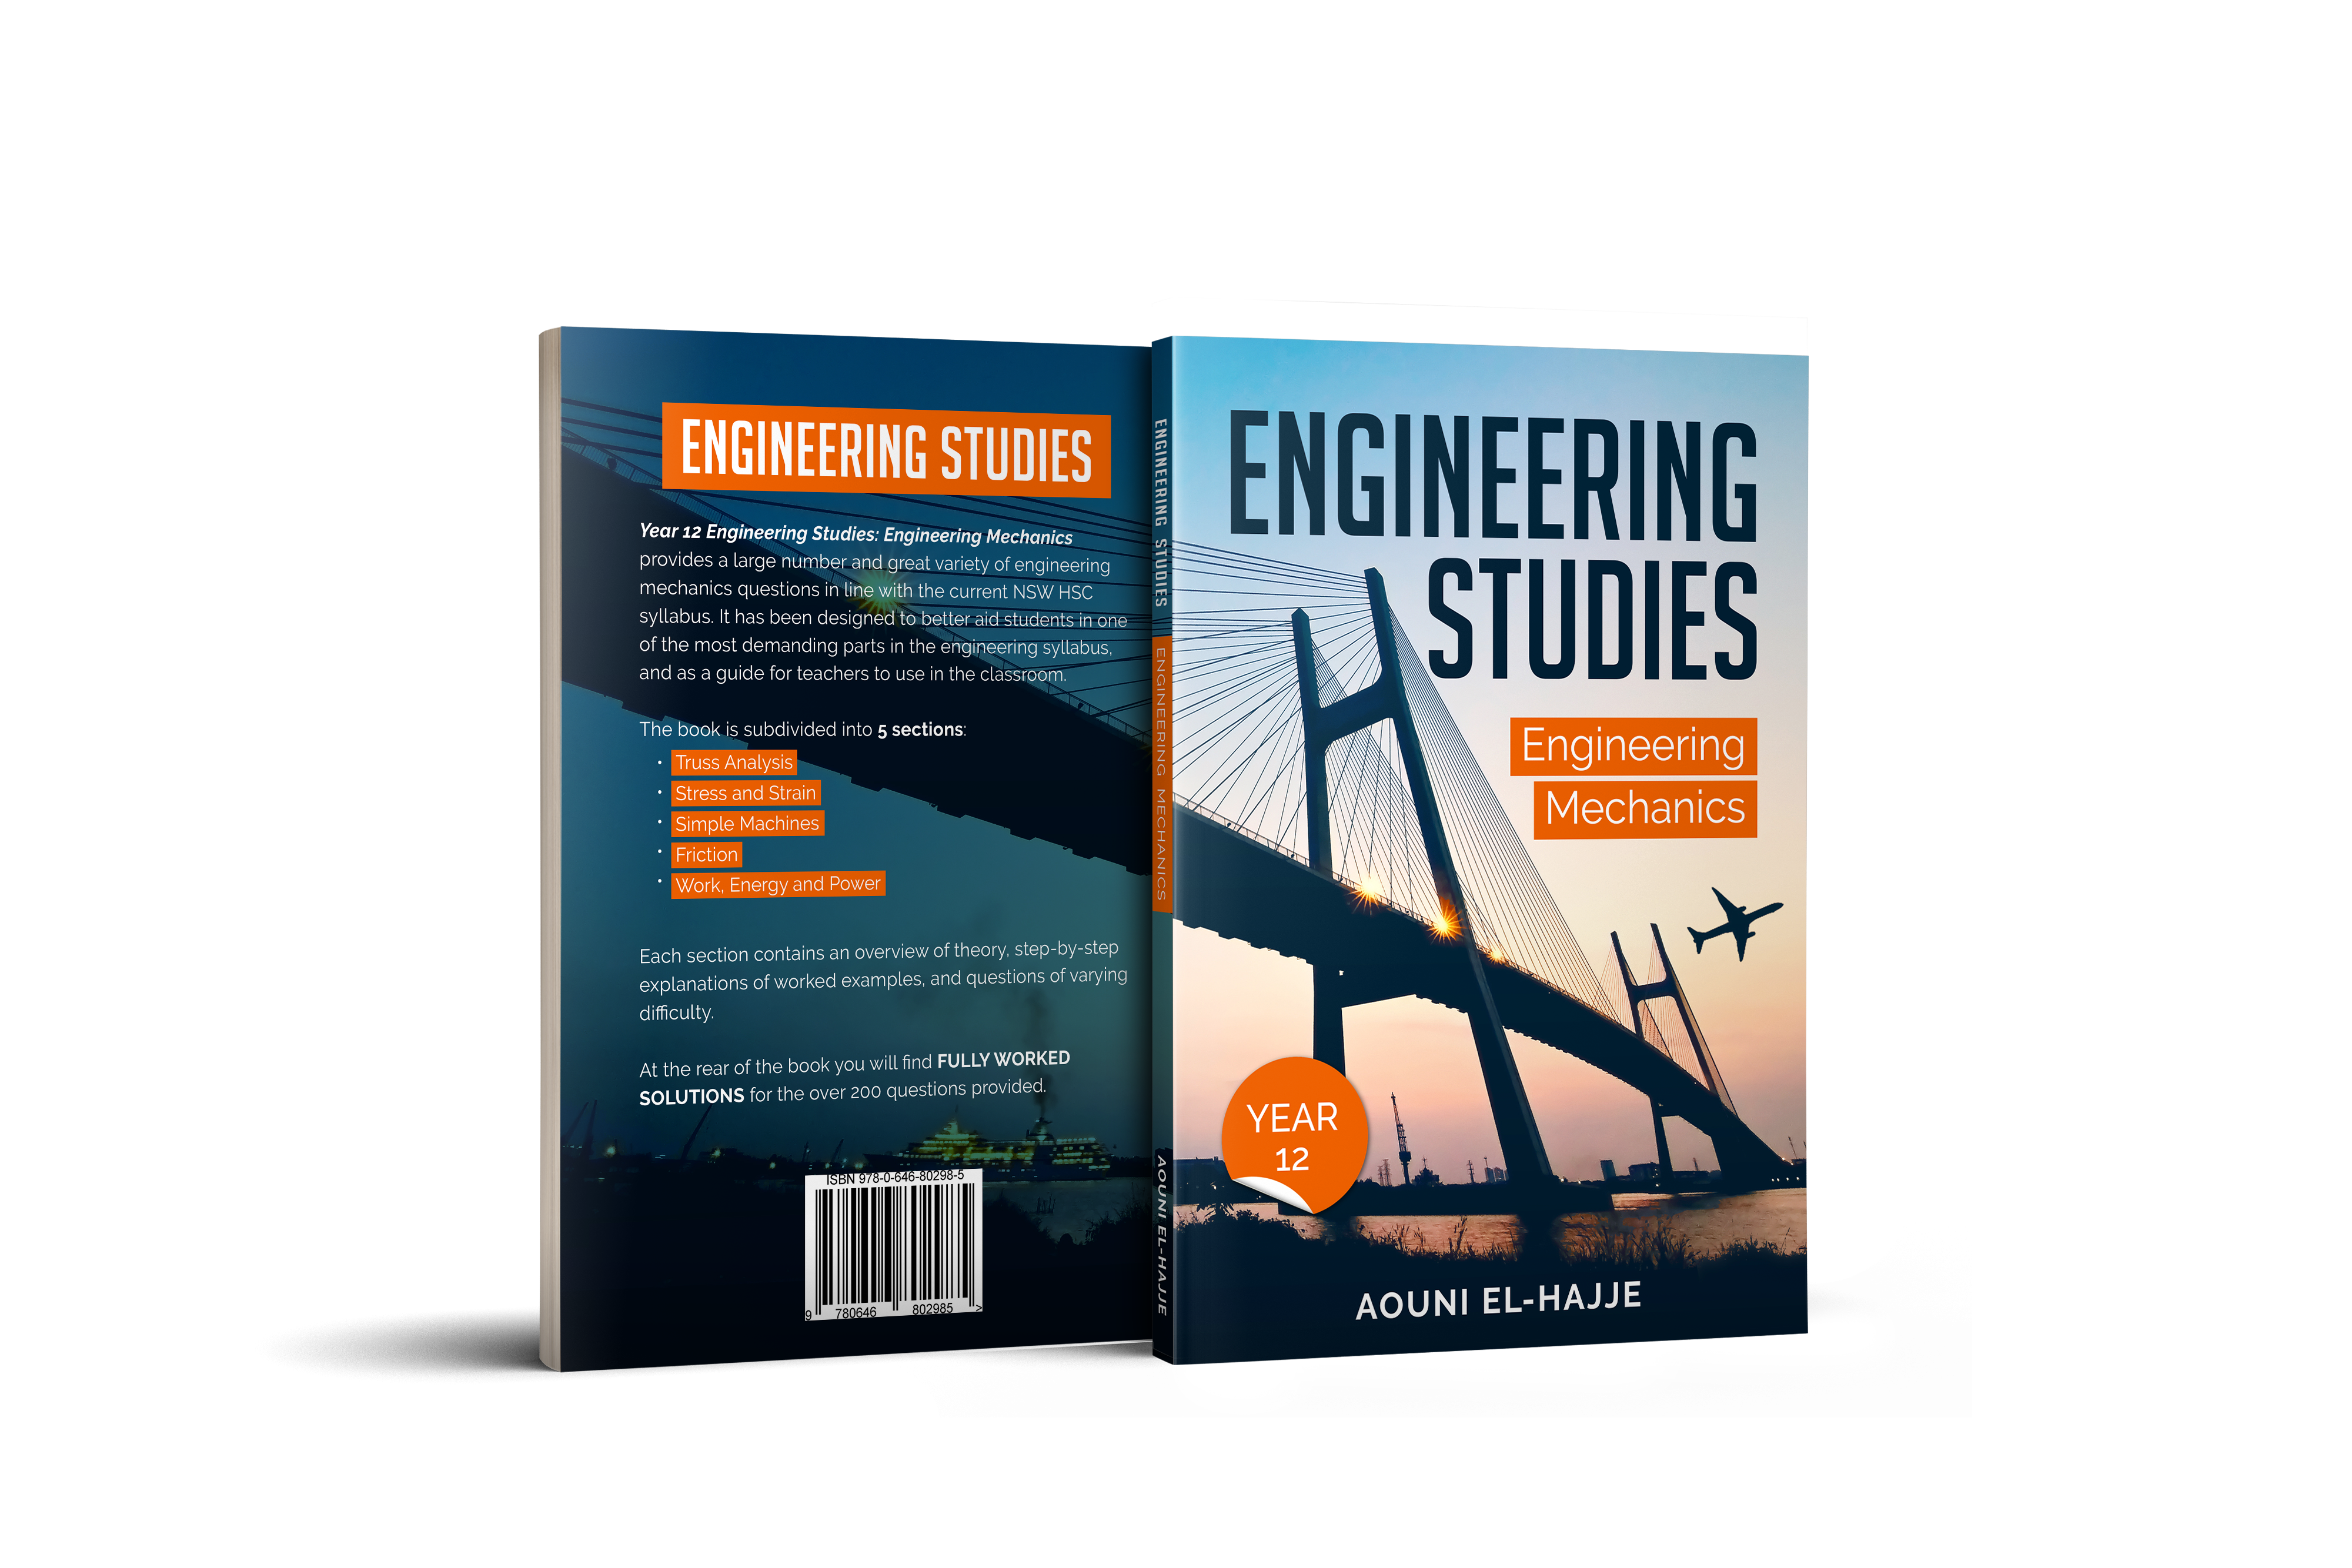 Engineering Mechanics Textbook Cover Design